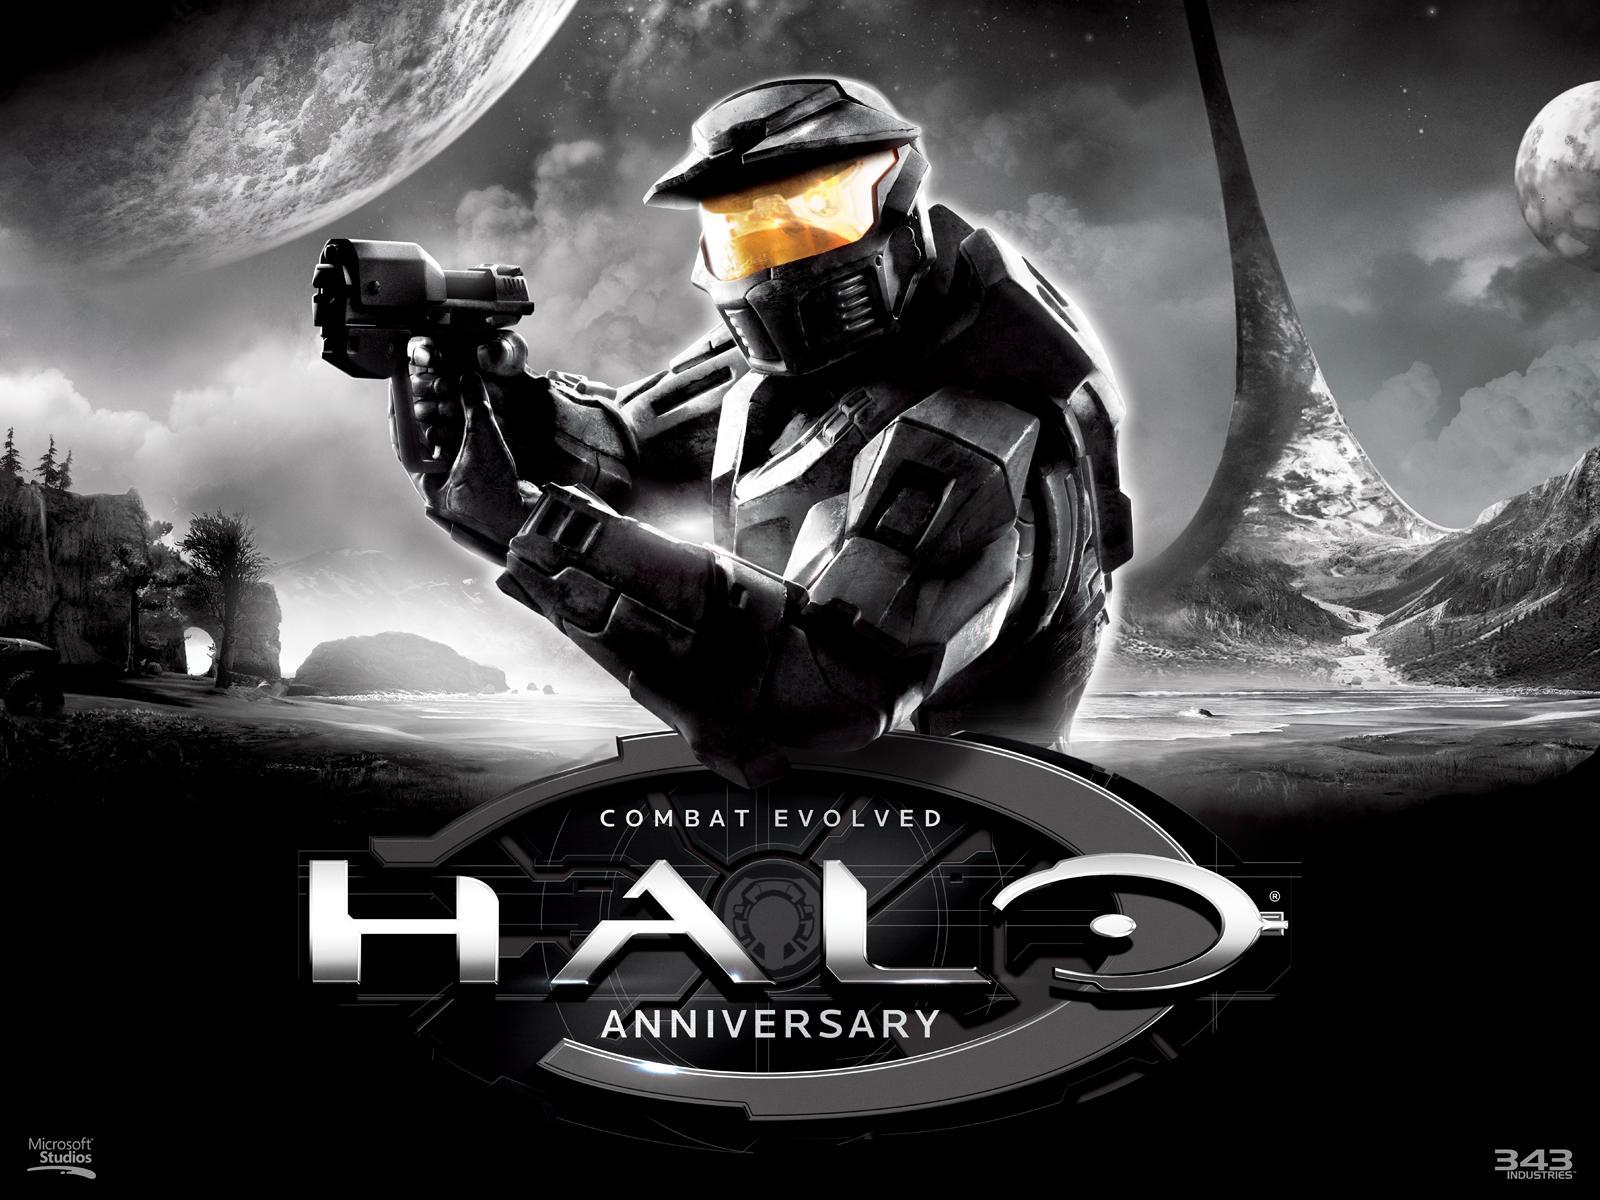 Halo-Combat-Evolved.jpg